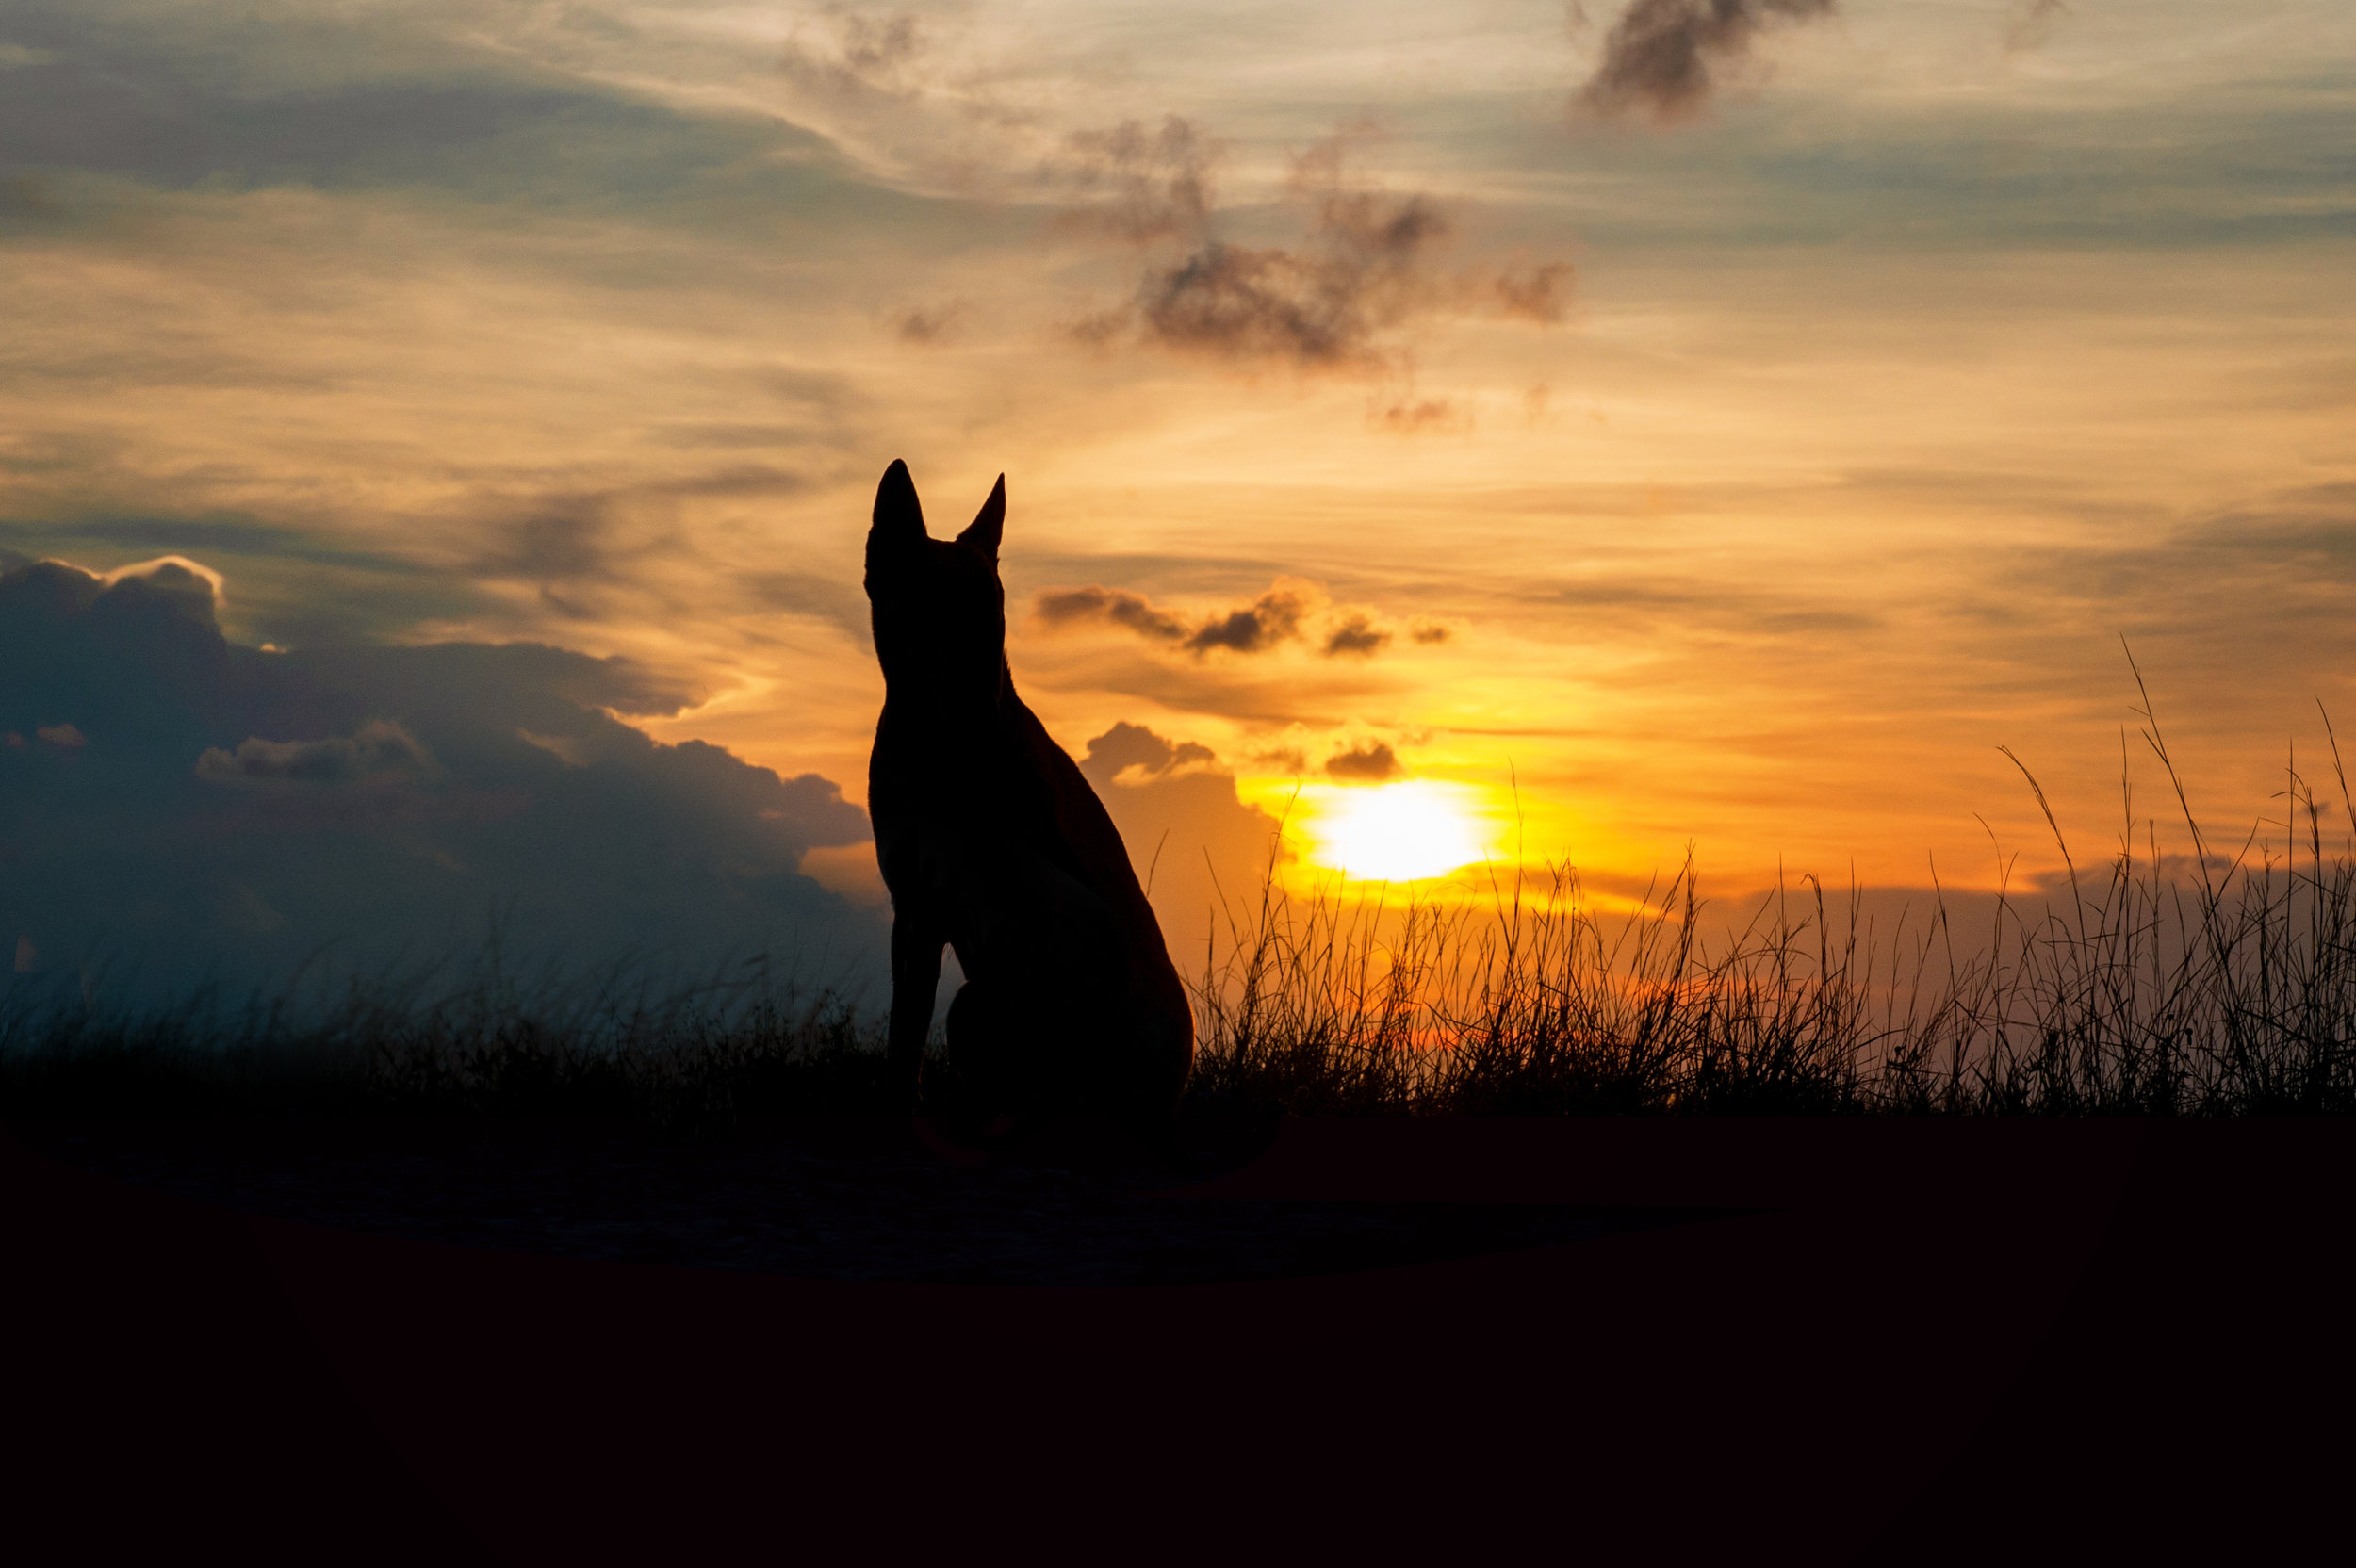 Paola-Paladini-Sunset-Silhouettes-Dog-Shepheard